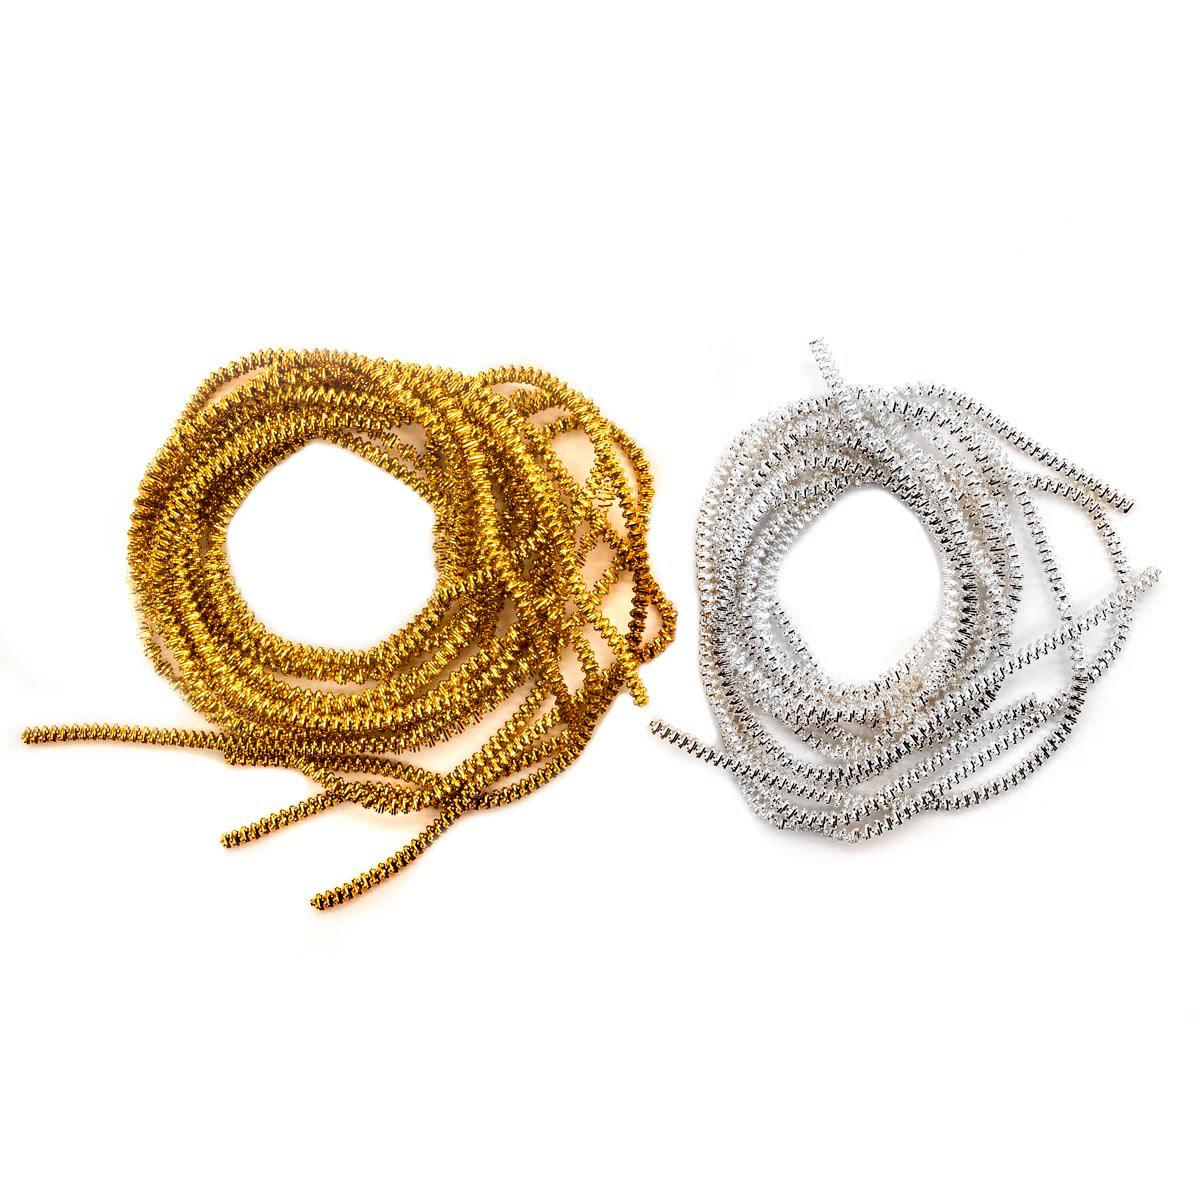 Набор декоративной проволоки-трунцала, 3мм, цвета золото и серебро, 3,5м, Glorex